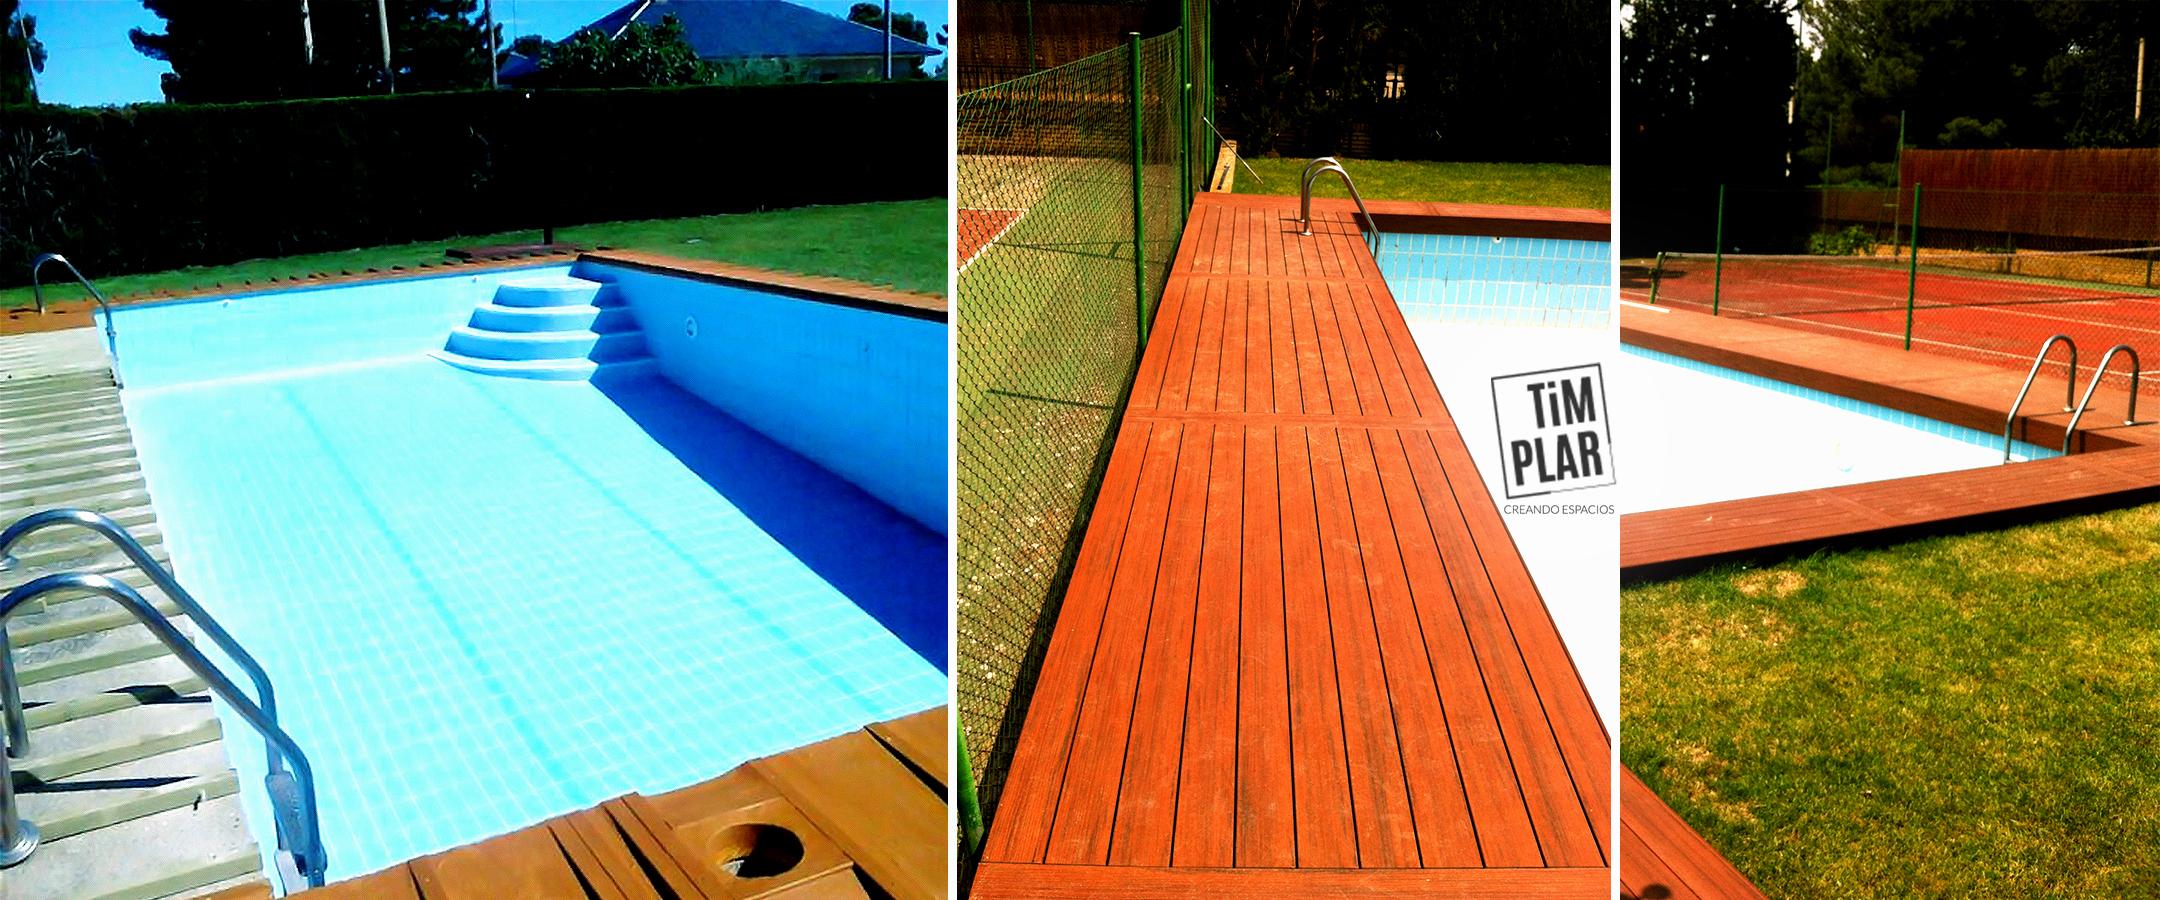 reforma suelo piscina